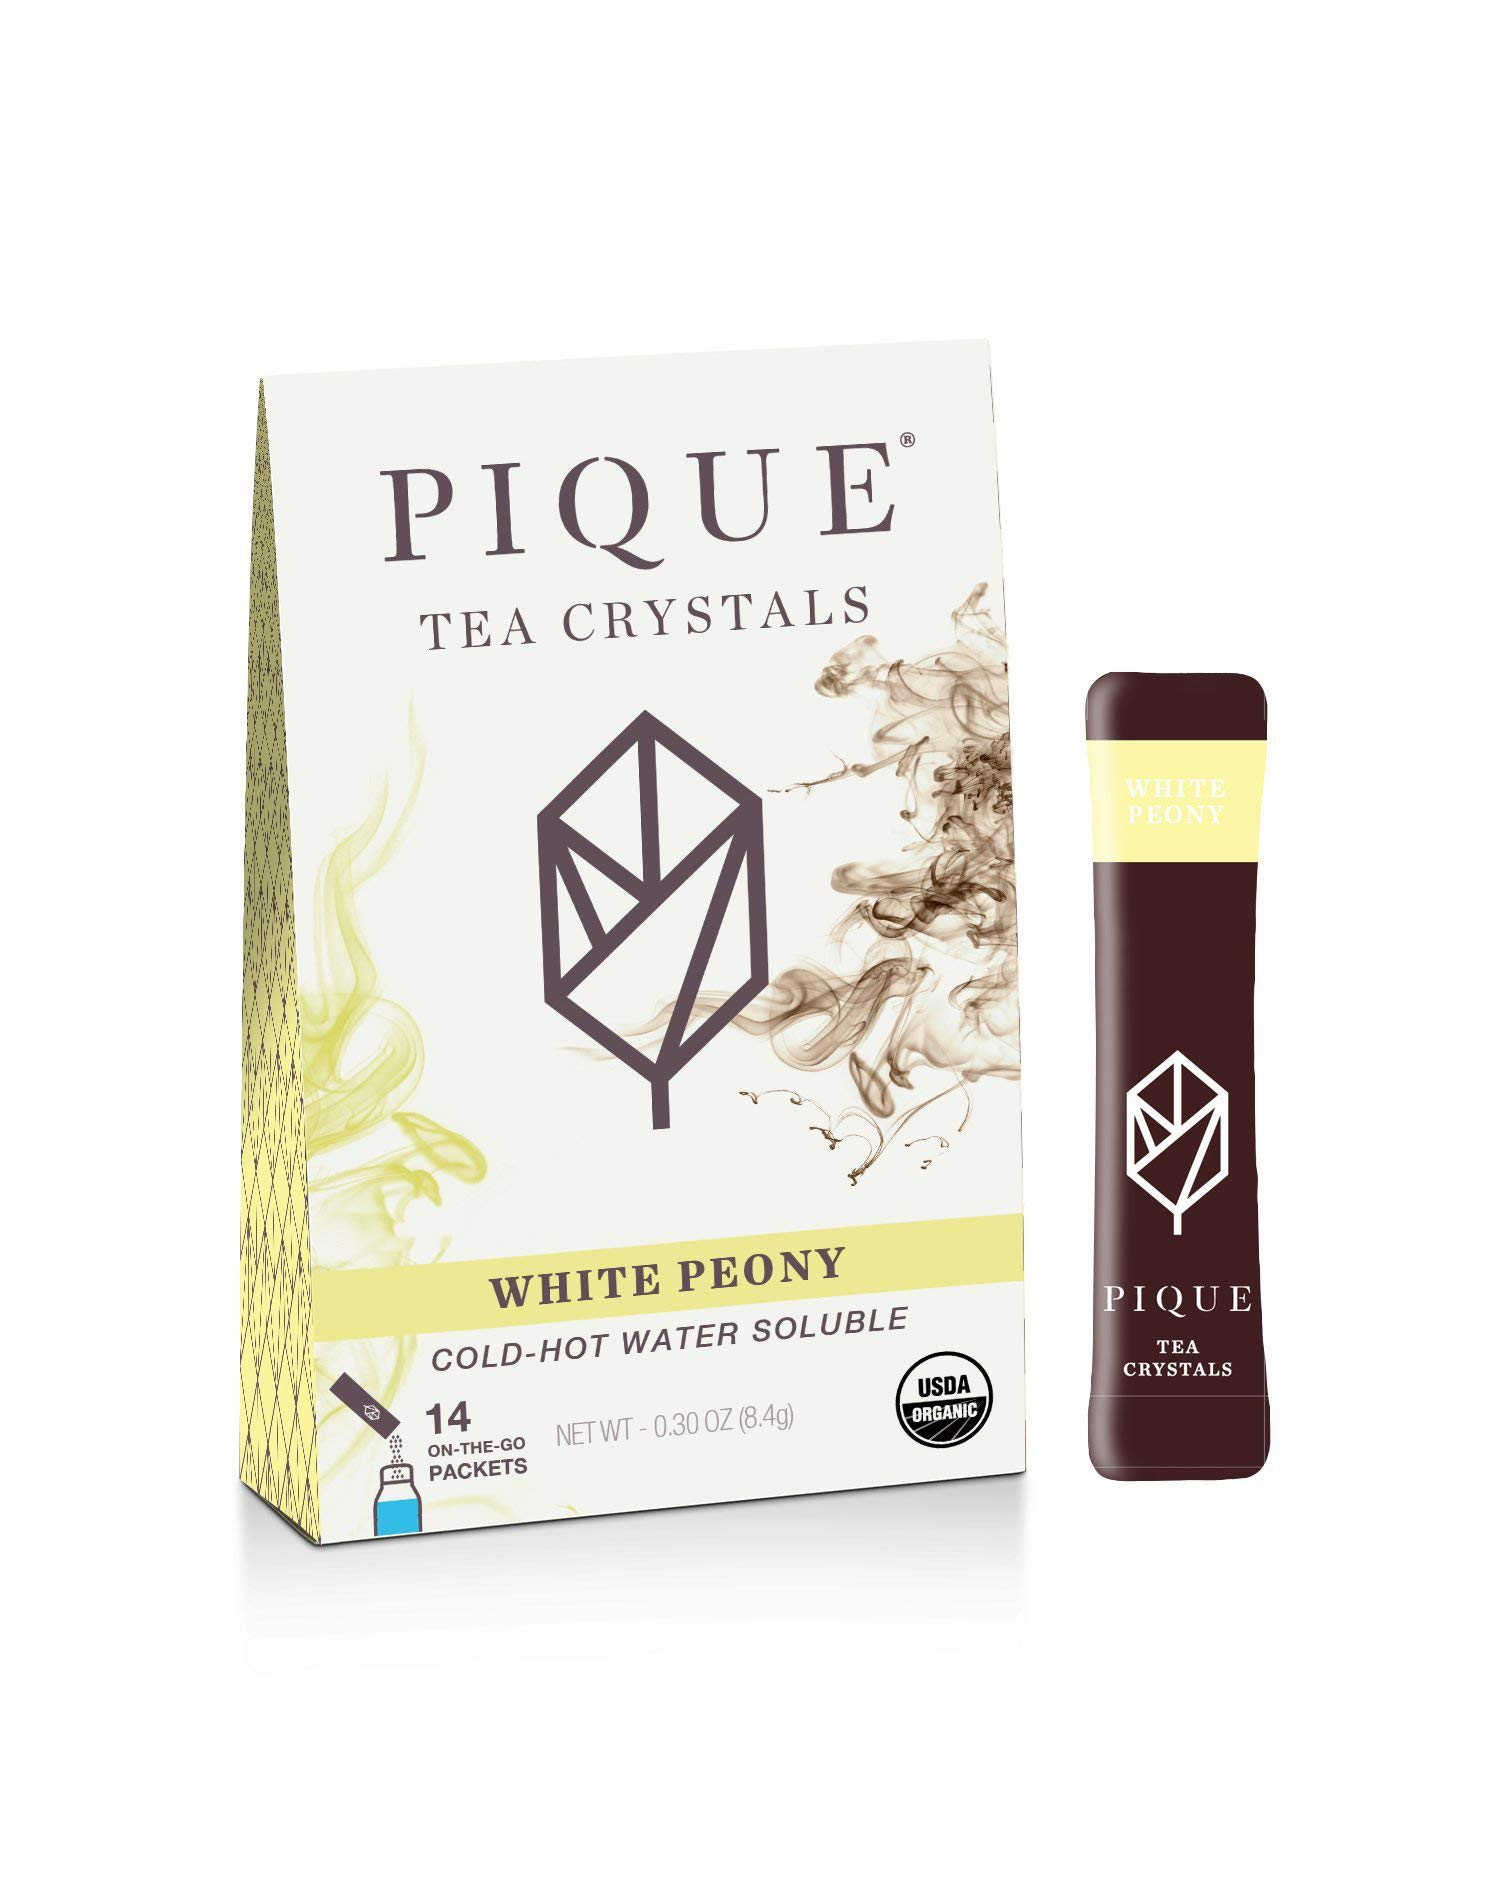 Pique Tea Organic White Peony Tea Crystals - Gut Health, Fasting, Calm - 1 Pack (14 sticks) by PIQUE